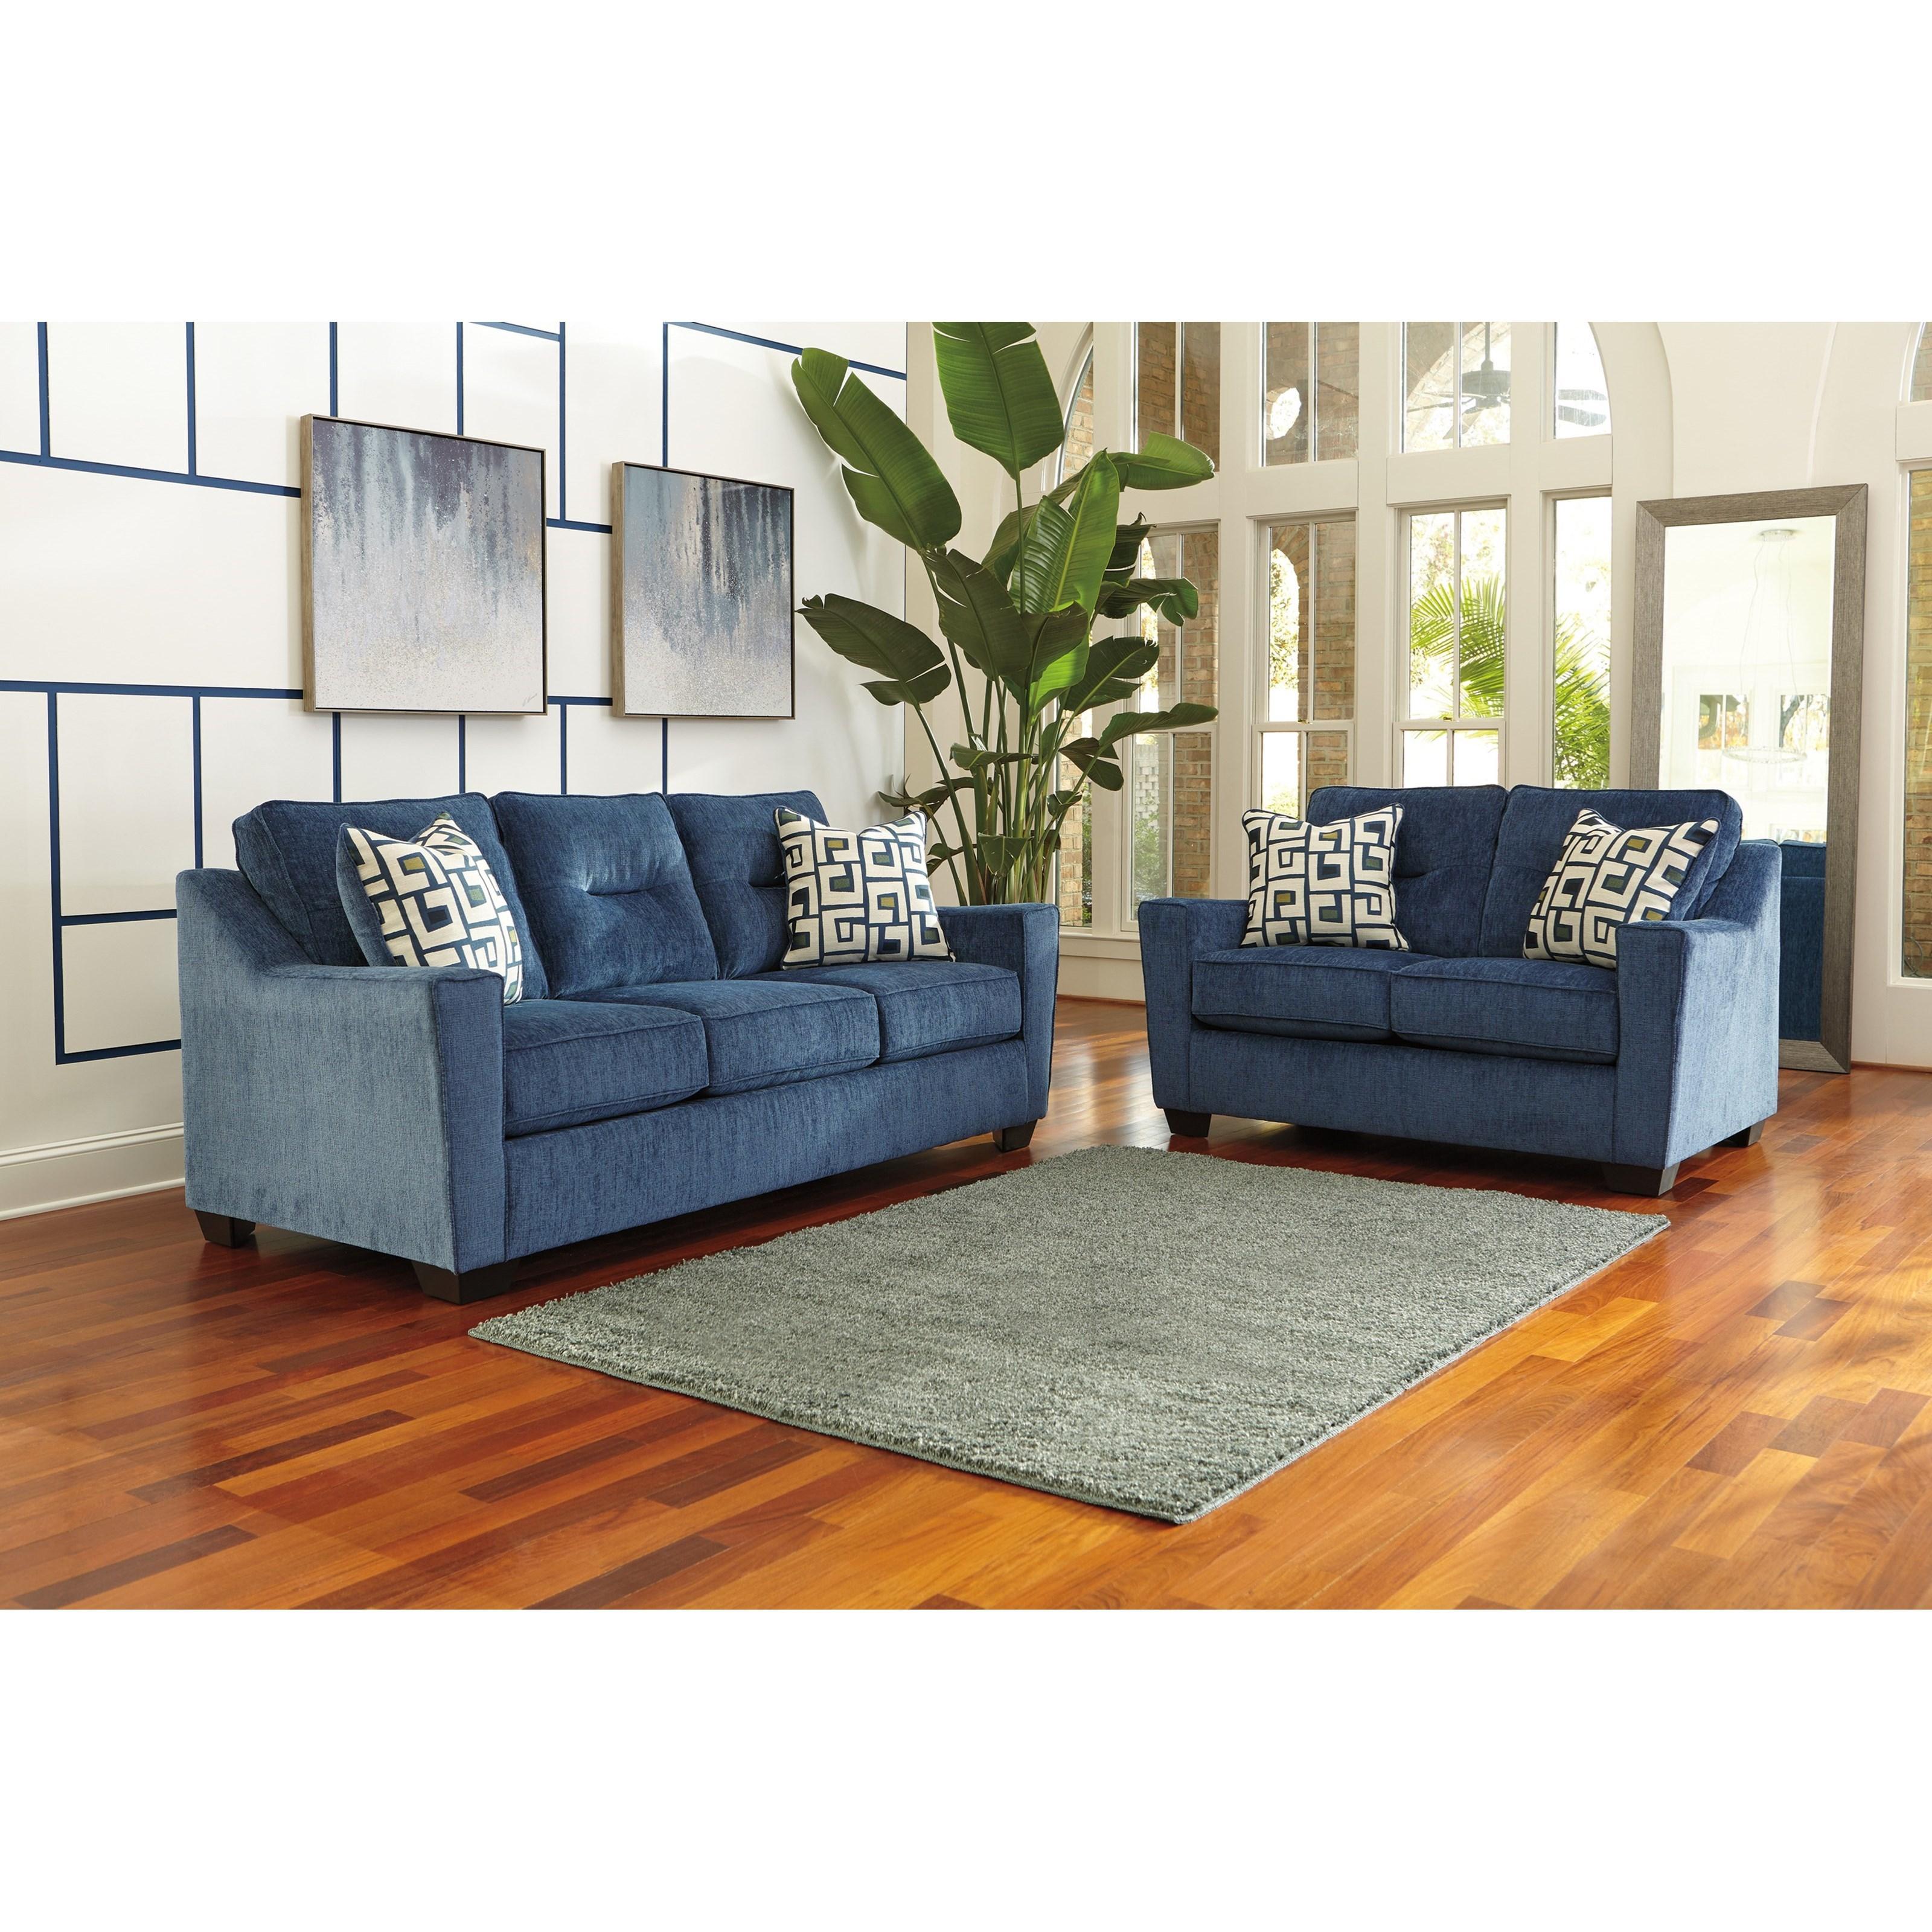 Ashley Furniture Cerdic Stationary Living Room Group   Pedigo Furniture    Stationary Living Room Groups